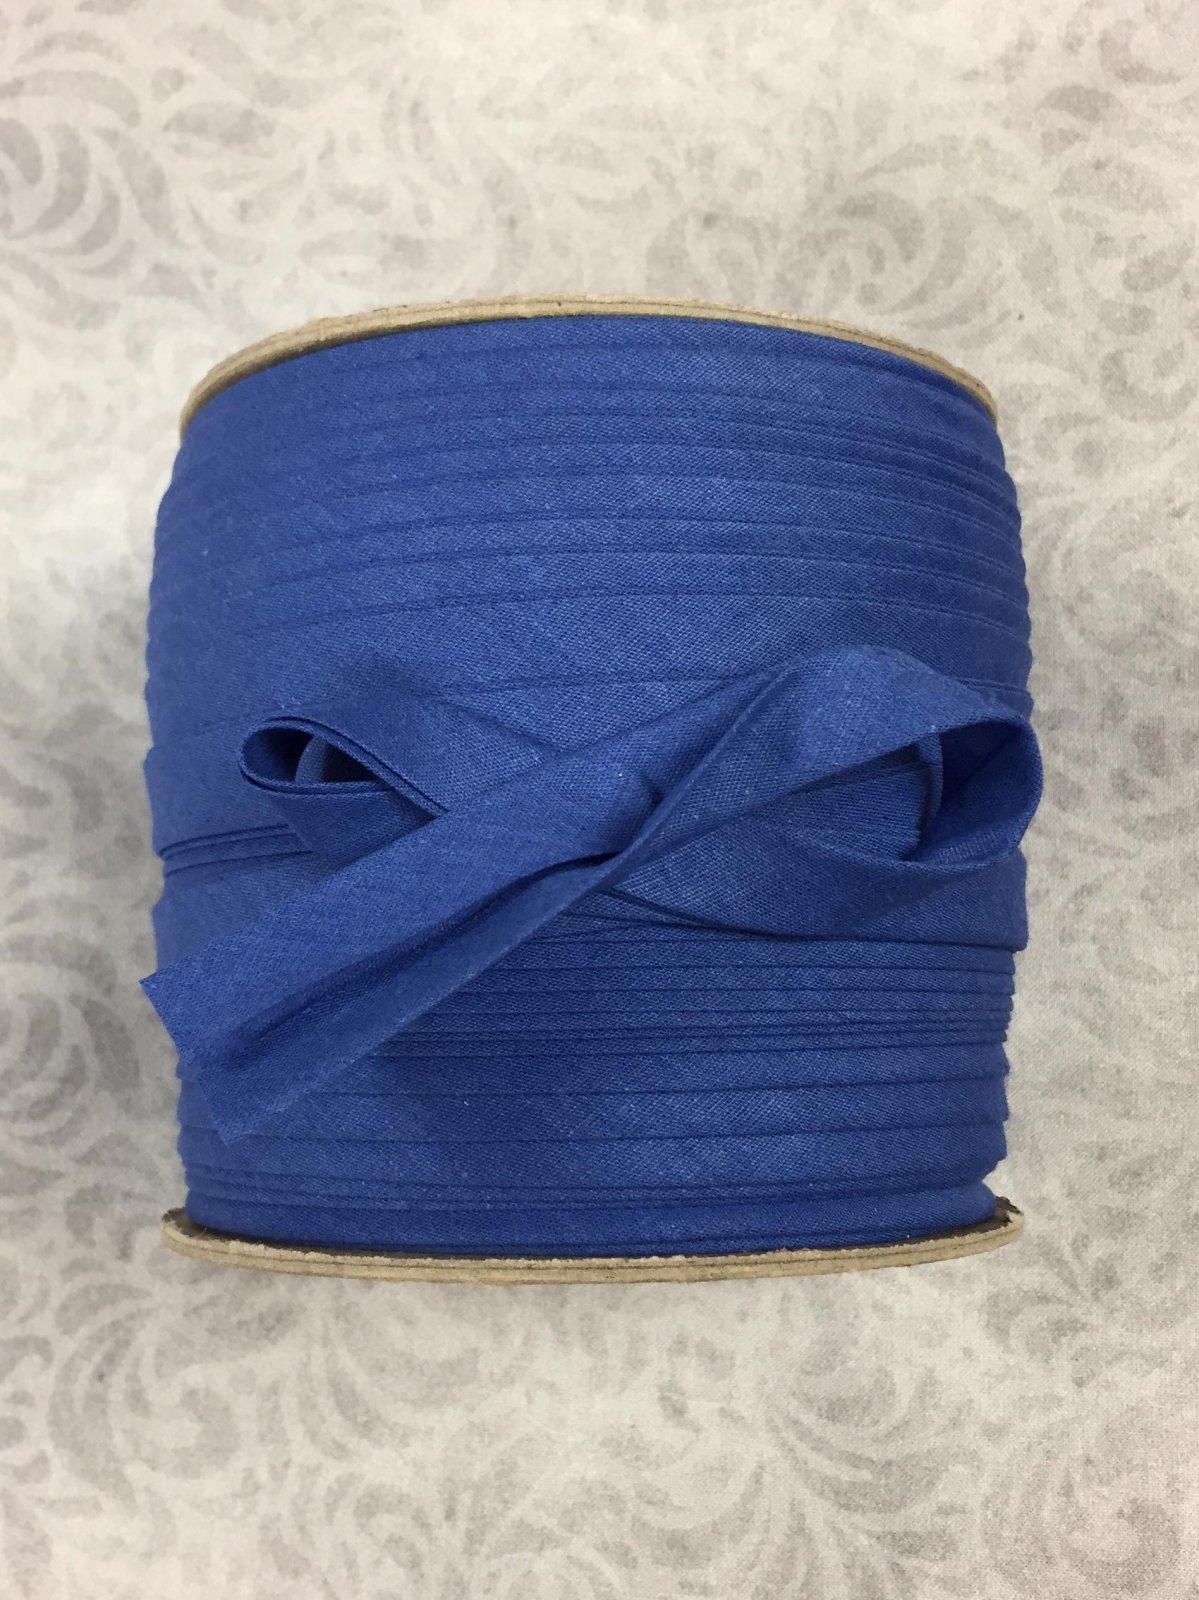 High Quality 1/2 Double Fold Bias Binding 10yd Cut - Royal